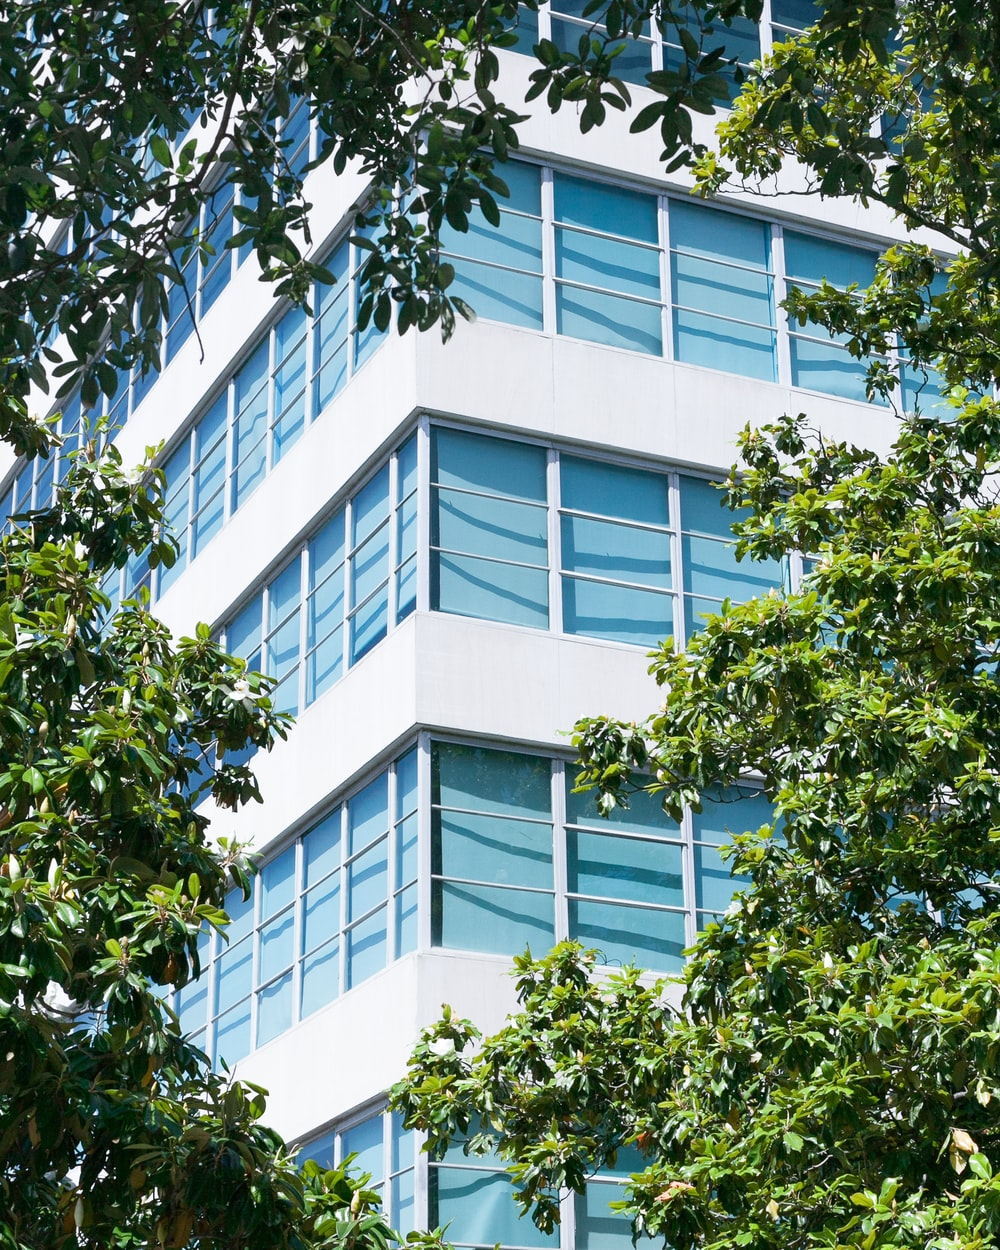 corner side of high-rise building between trees